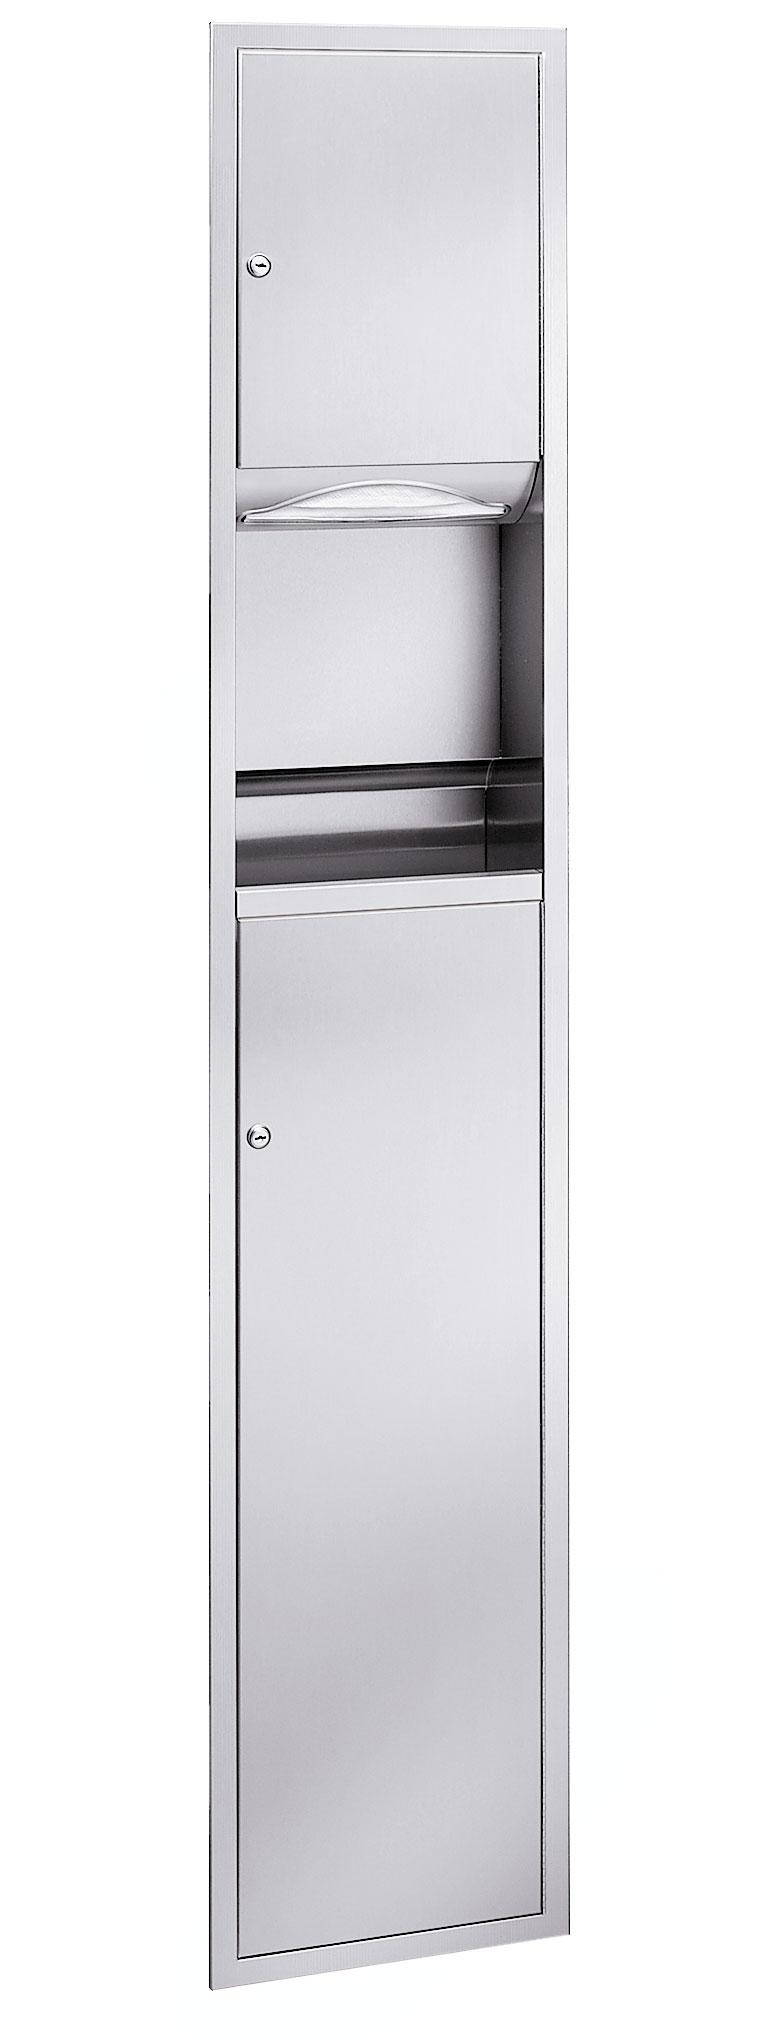 Bradley 225-10 Semi-Recessed Paper Folded Towel Dispenser & 9.2 gal. Waste Receptacle